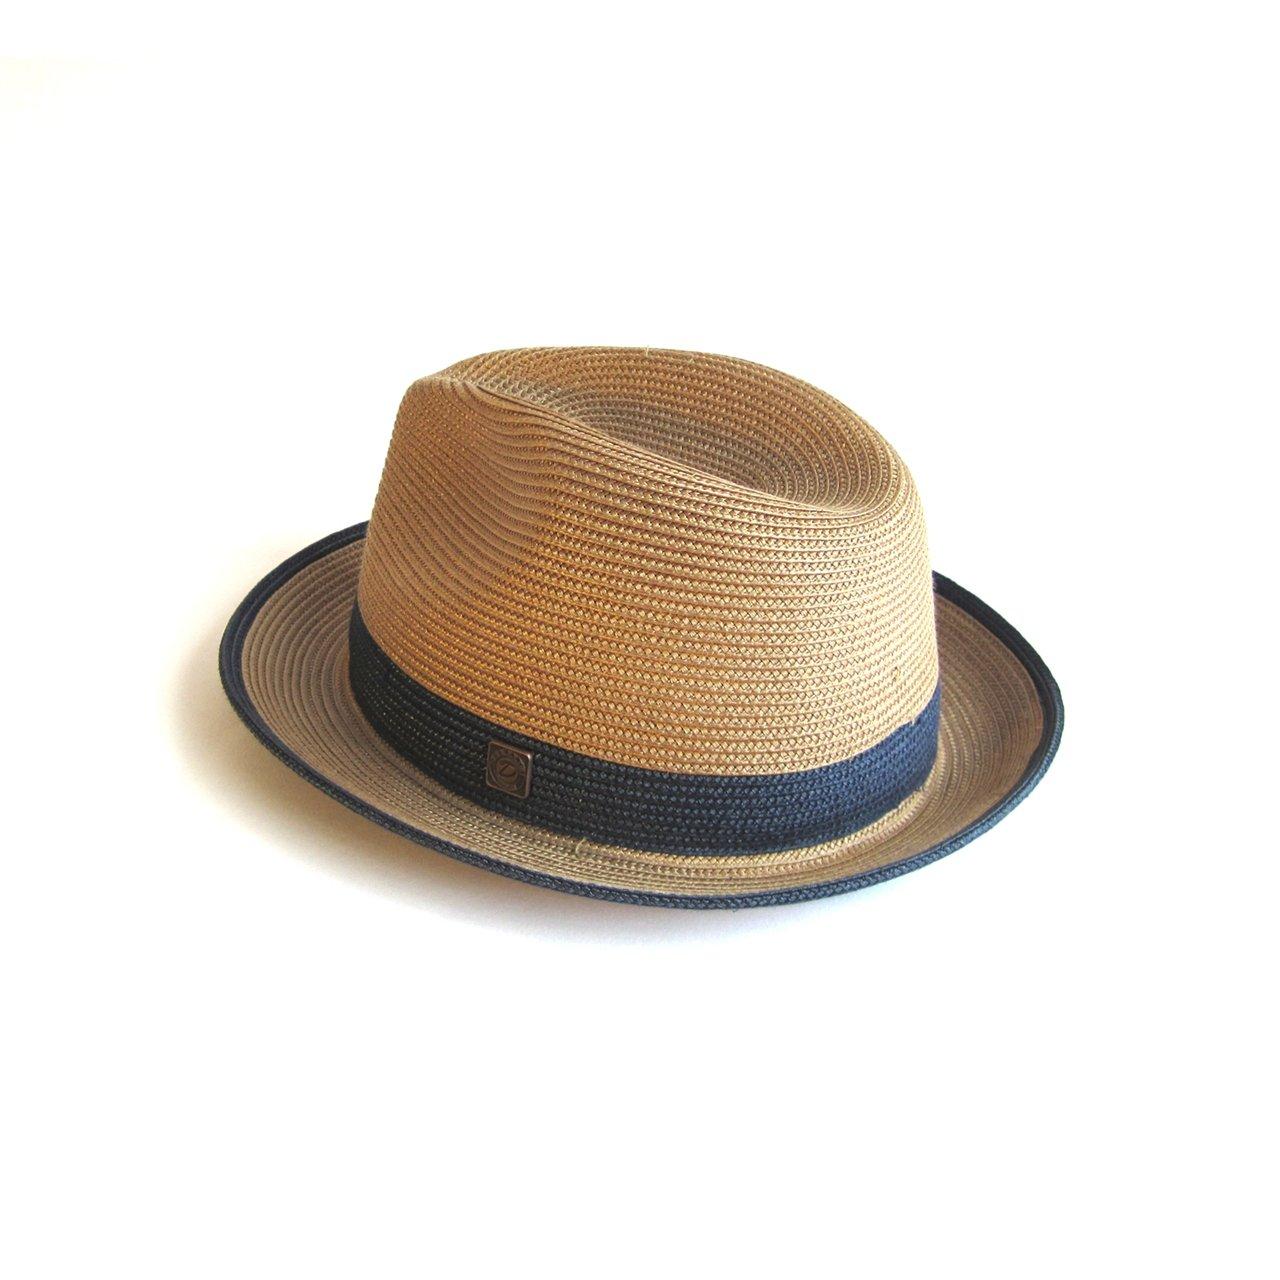 e7fbc4c231c727 Dasmarca Mens Womens Summer Straw Fedora Wide Brim Hat: Amazon.co.uk:  Clothing